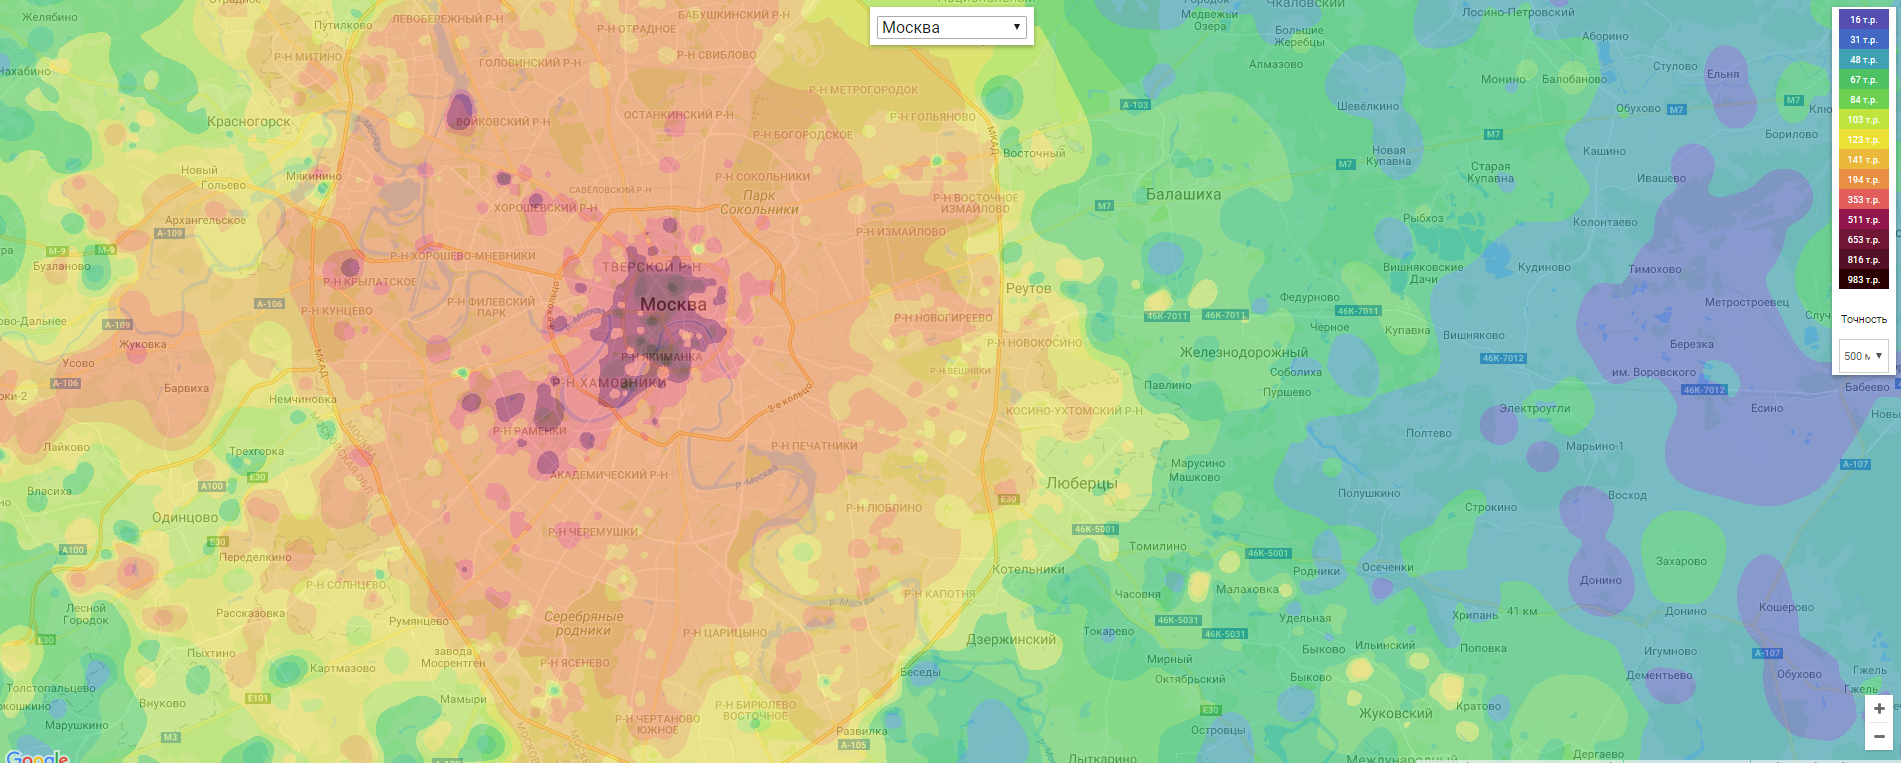 Тепловая карта цен Москвы